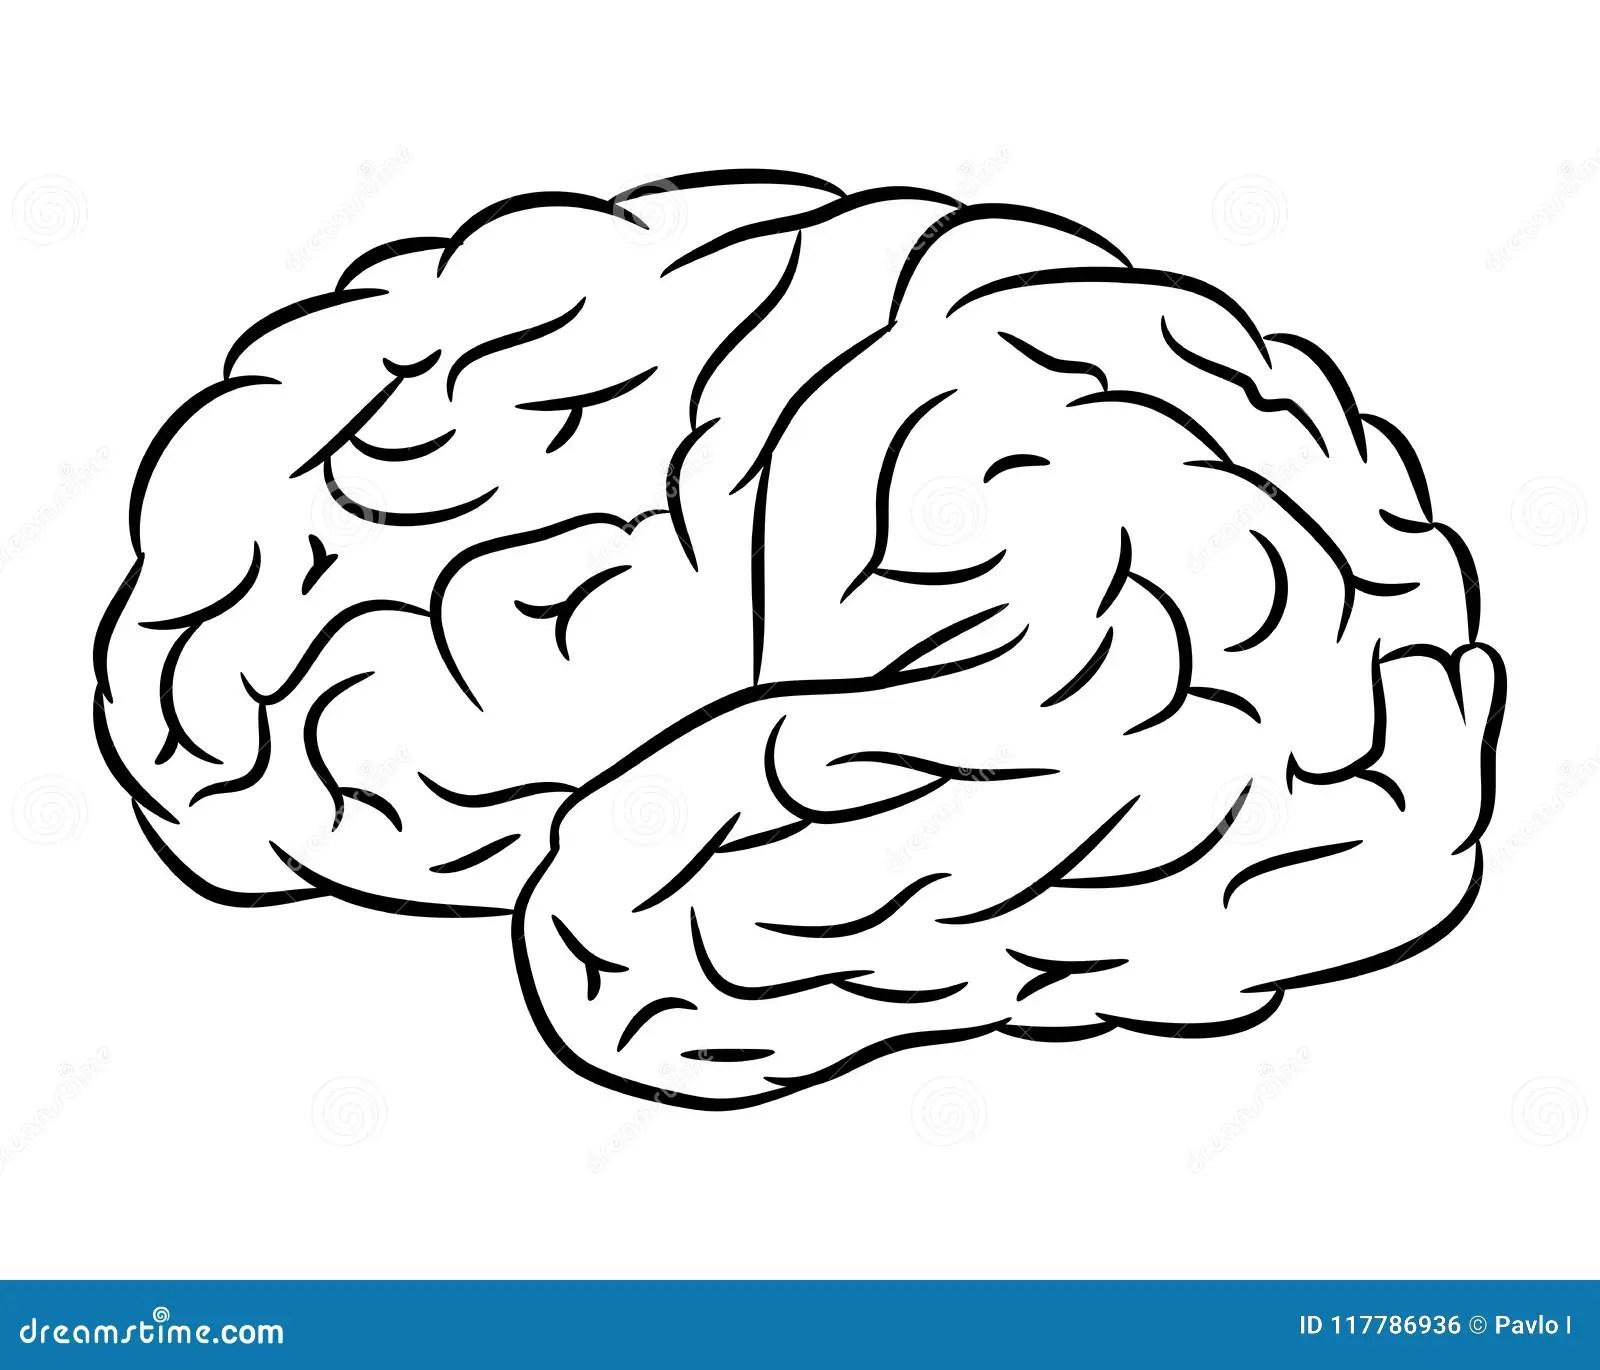 Simple Human Brain